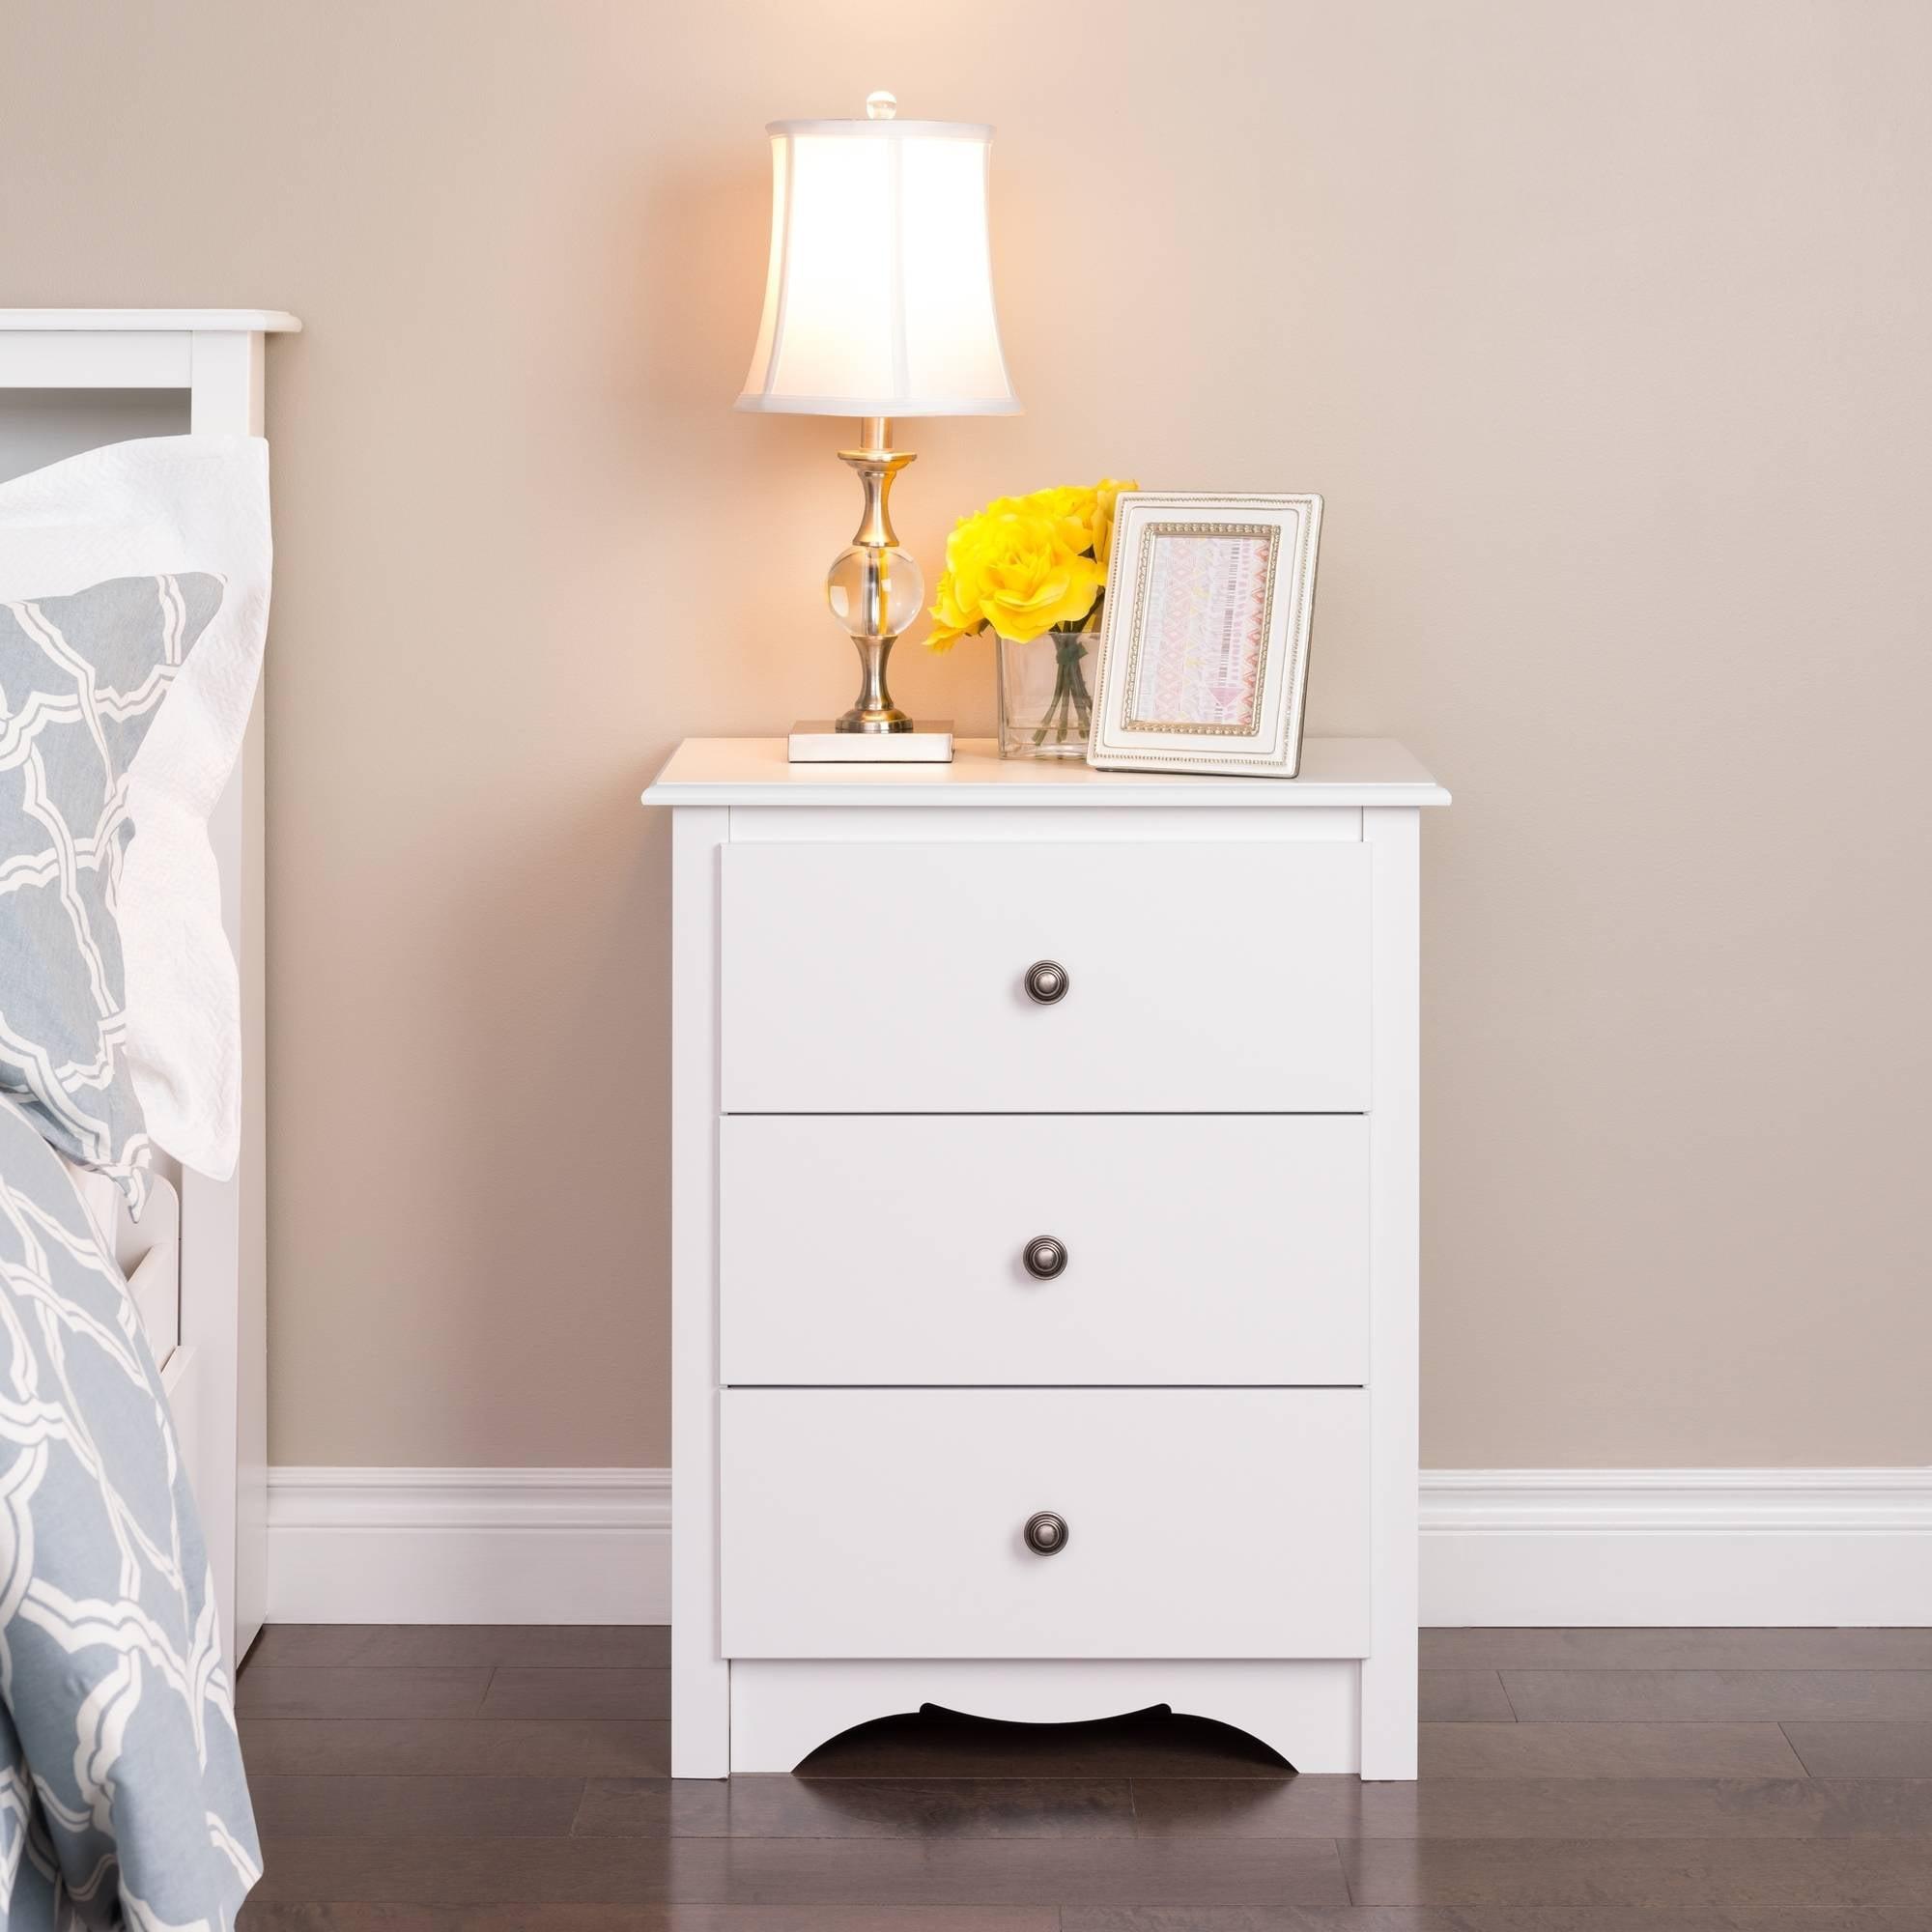 Monterey 3-Drawer Tall Nightstand, White by Prepac Manufacturing Ltd.